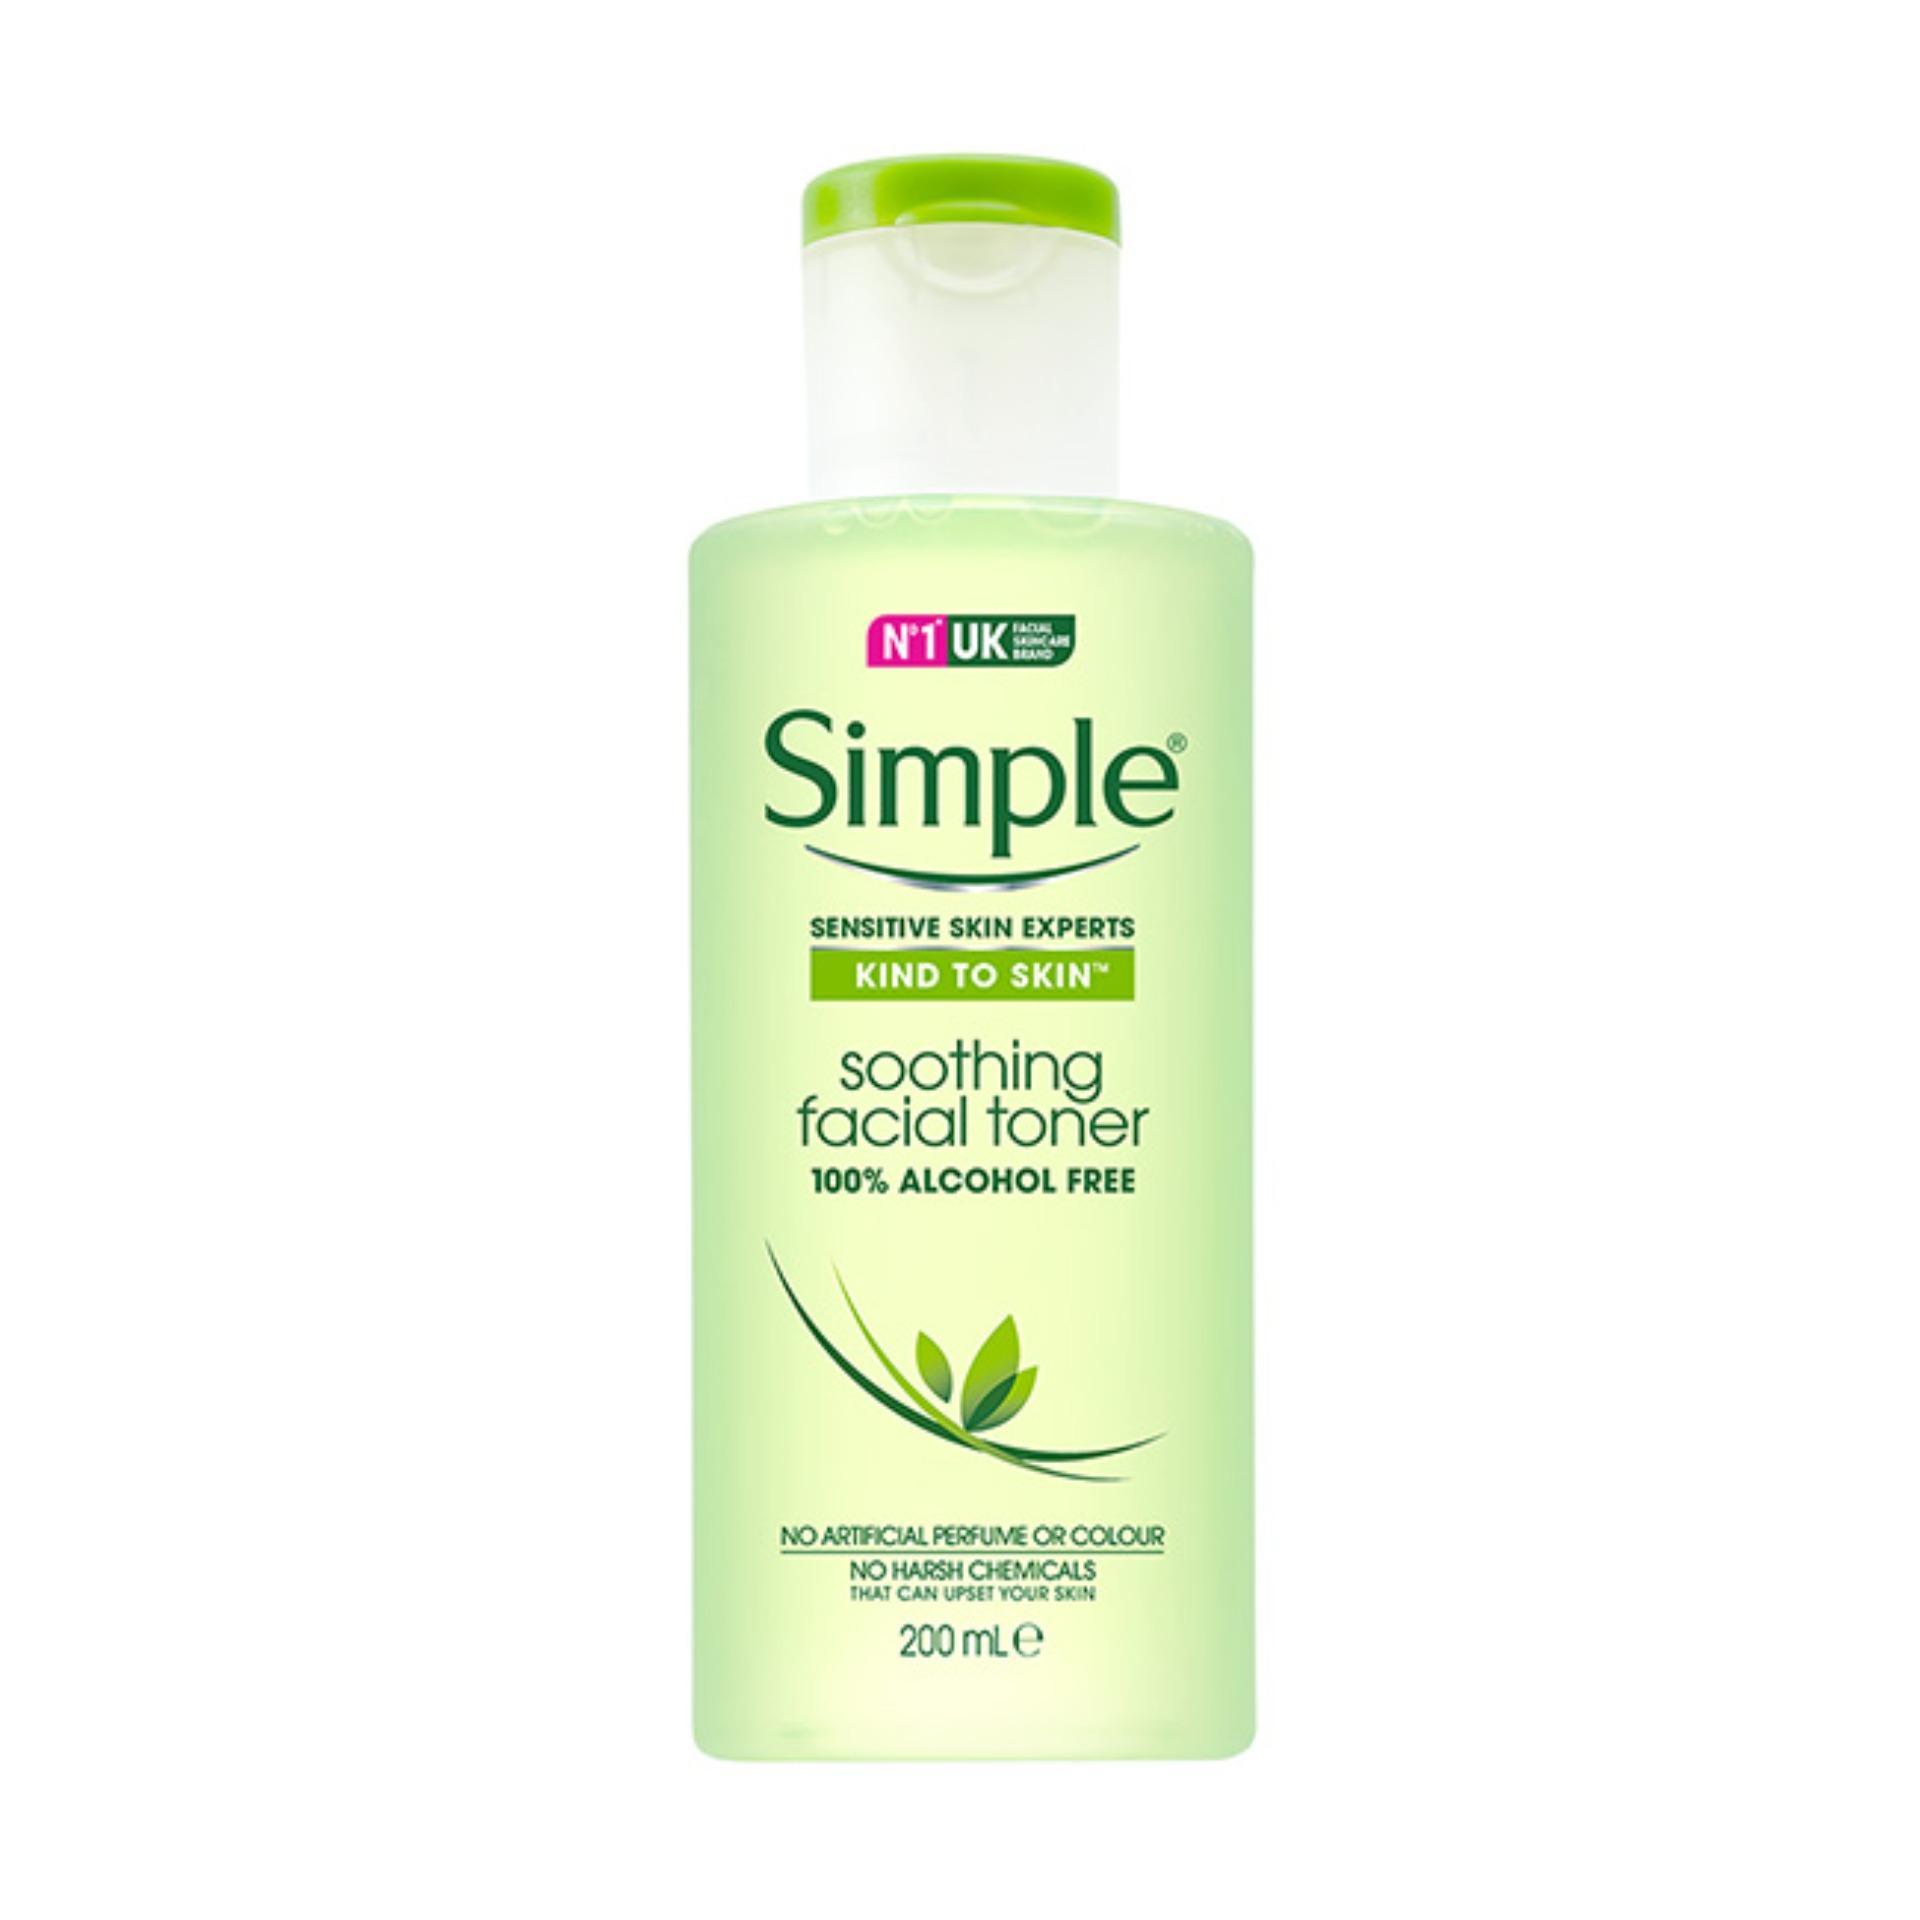 Nước hoa hồng Simple Kind To Skin Soothing Facial Toner 200ml (Mẫu mới 2017)